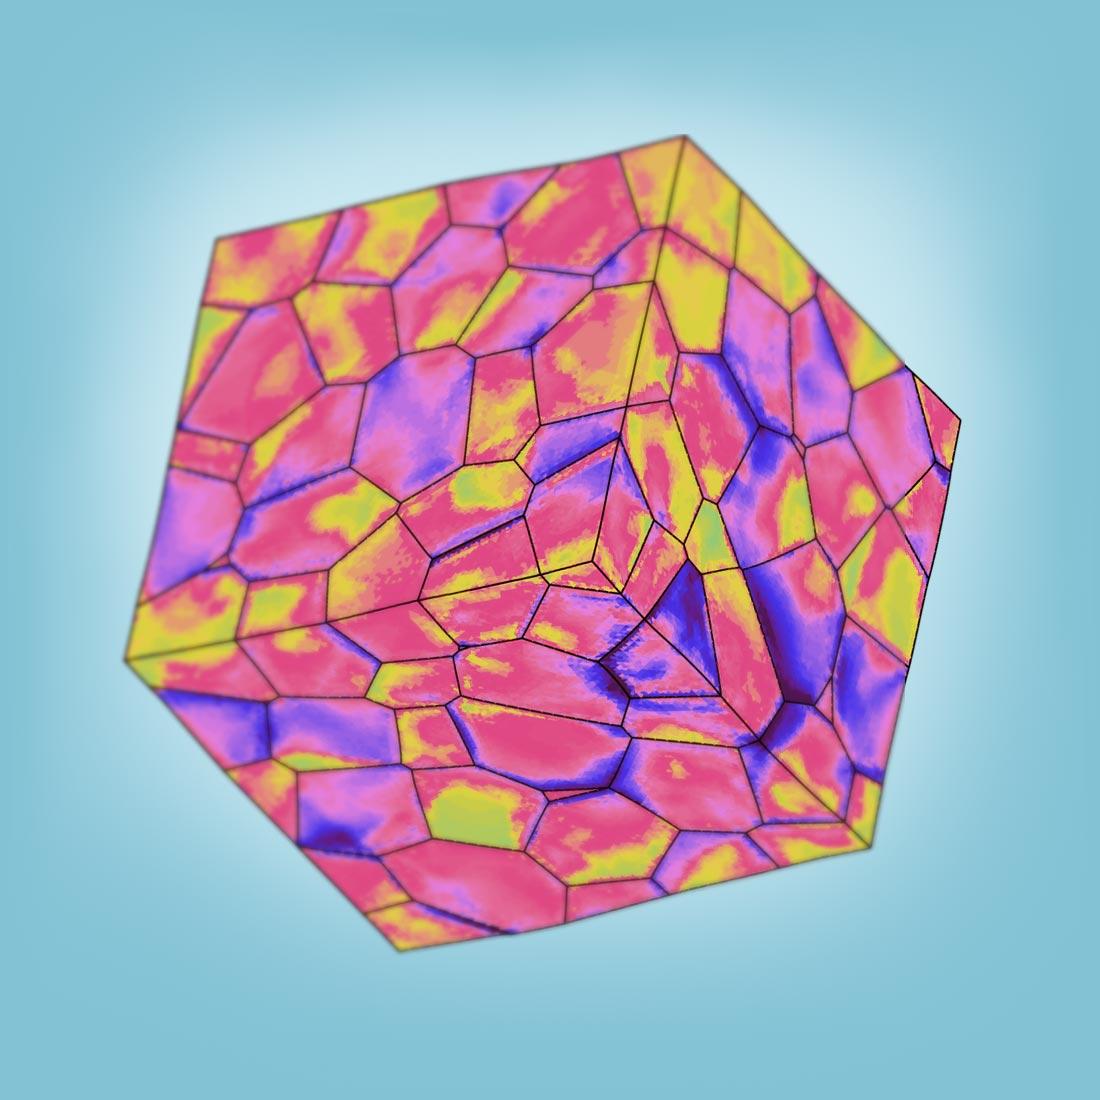 metallic microstructure